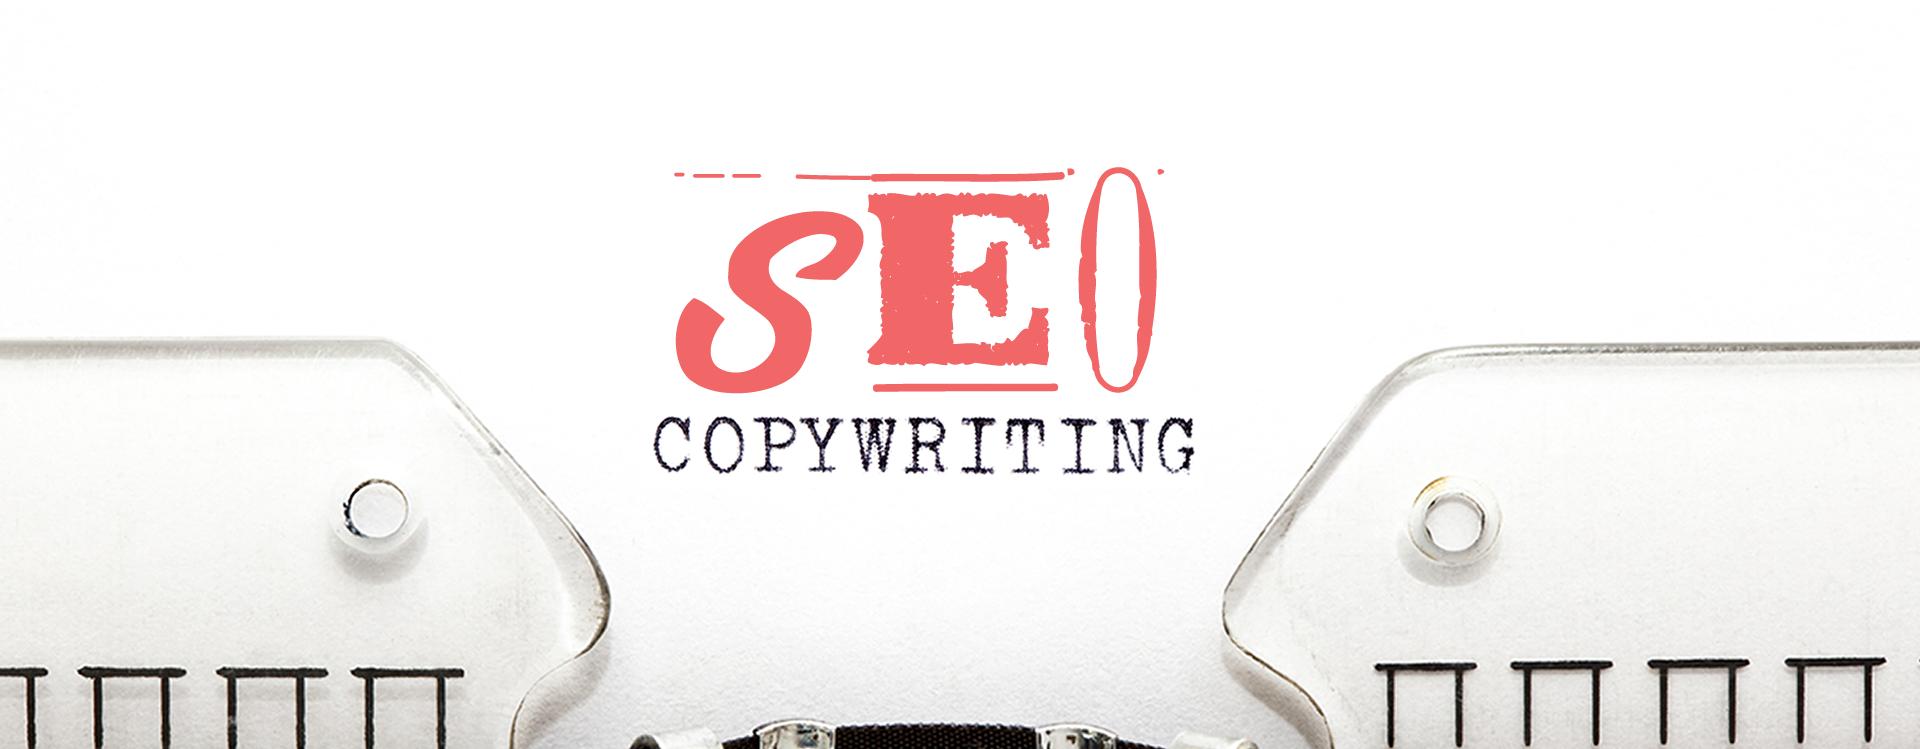 SEO Copywriting Services NYC, CT, NJ